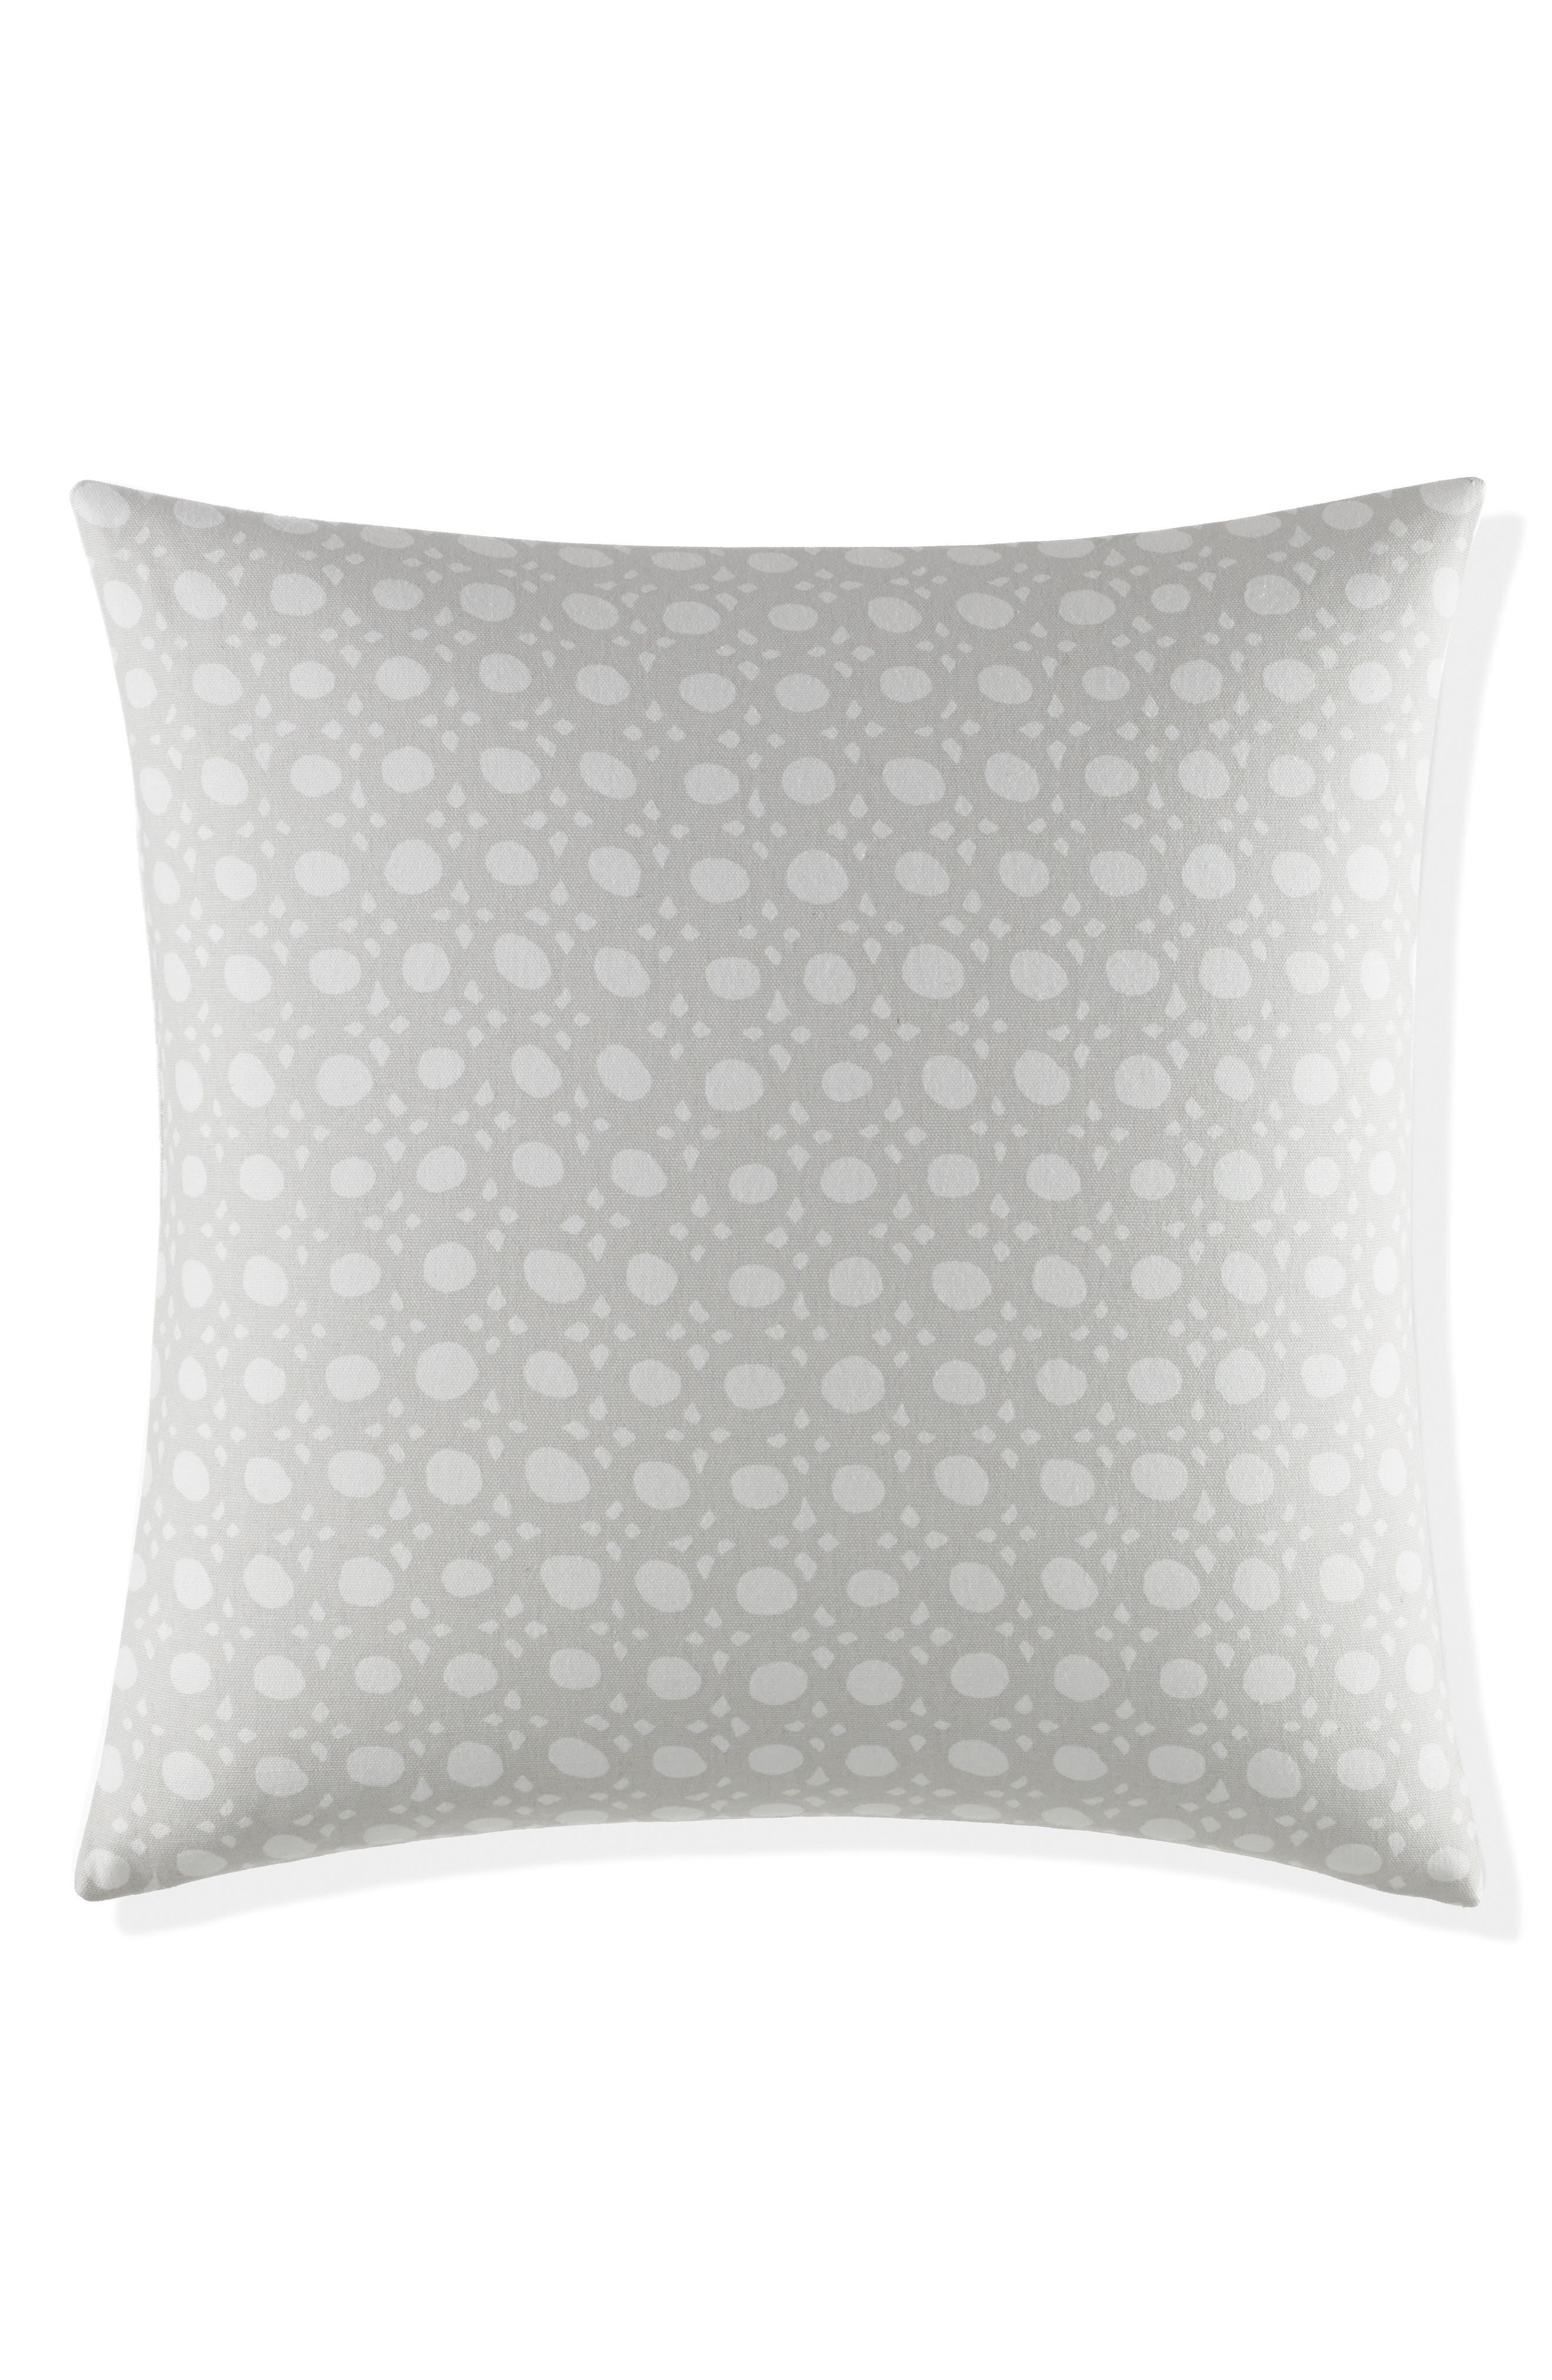 Main Image - kate spade new york caning pillow